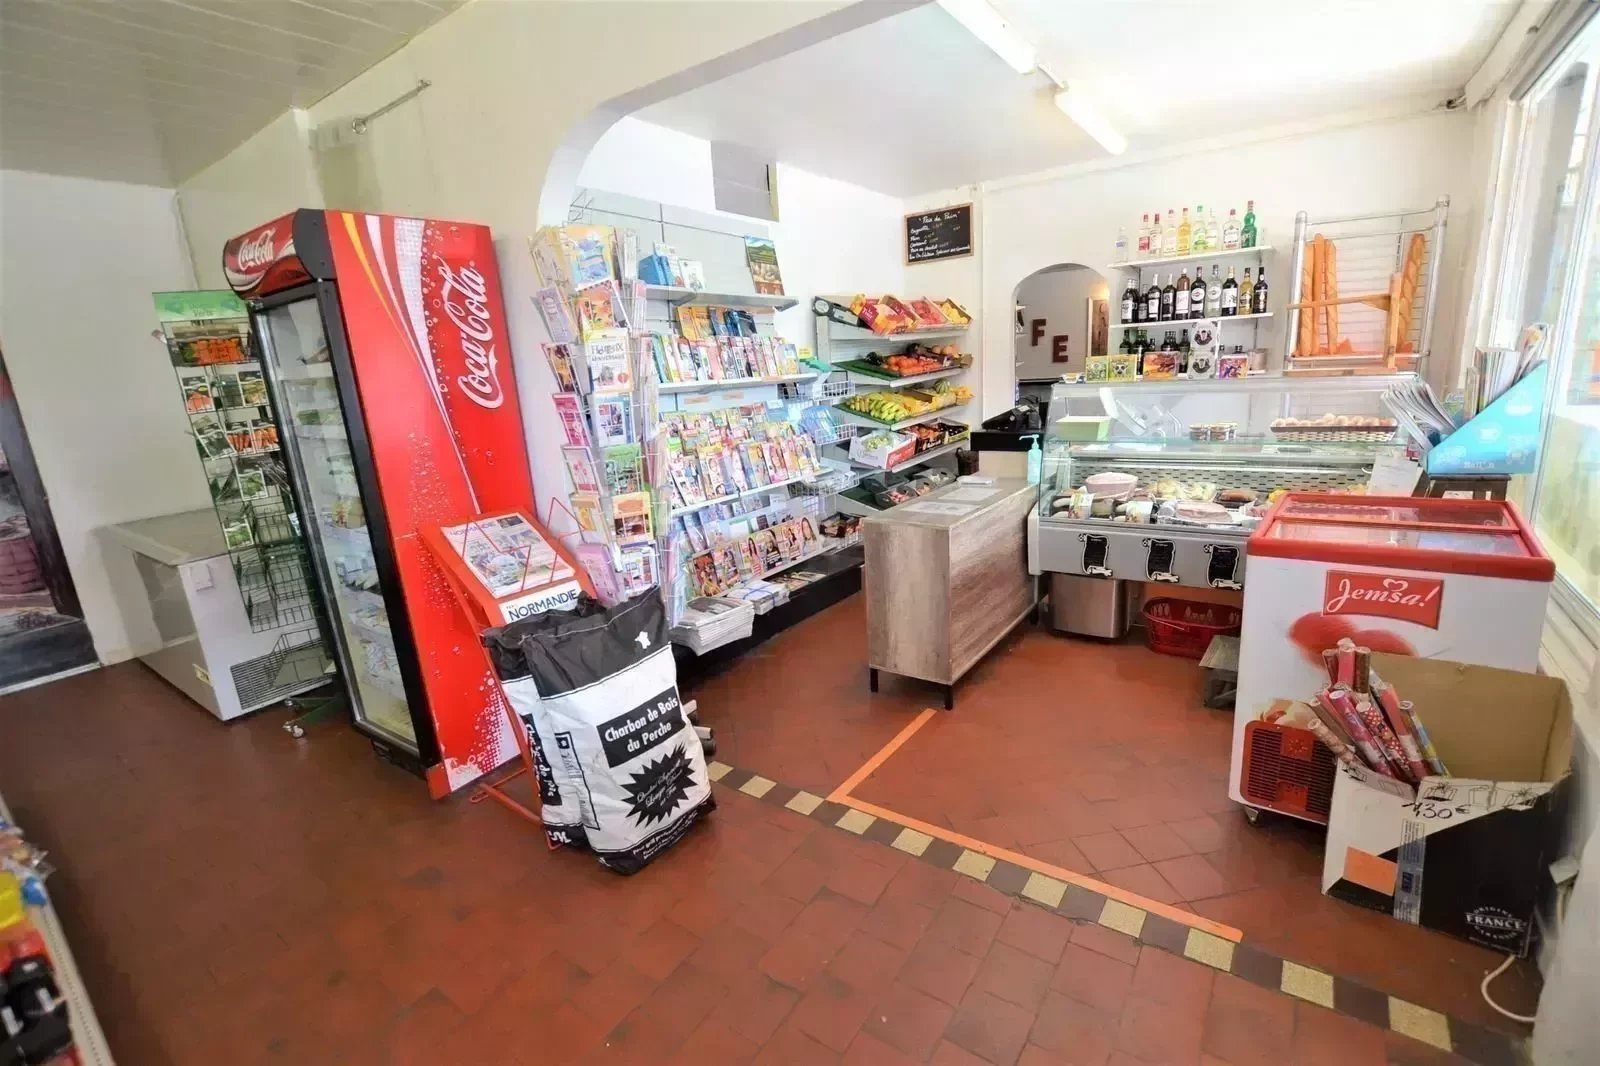 A vendre FOND de Commerce: BAR - Tabac - PMU - FDJ et  EPICERIE à Pavilly